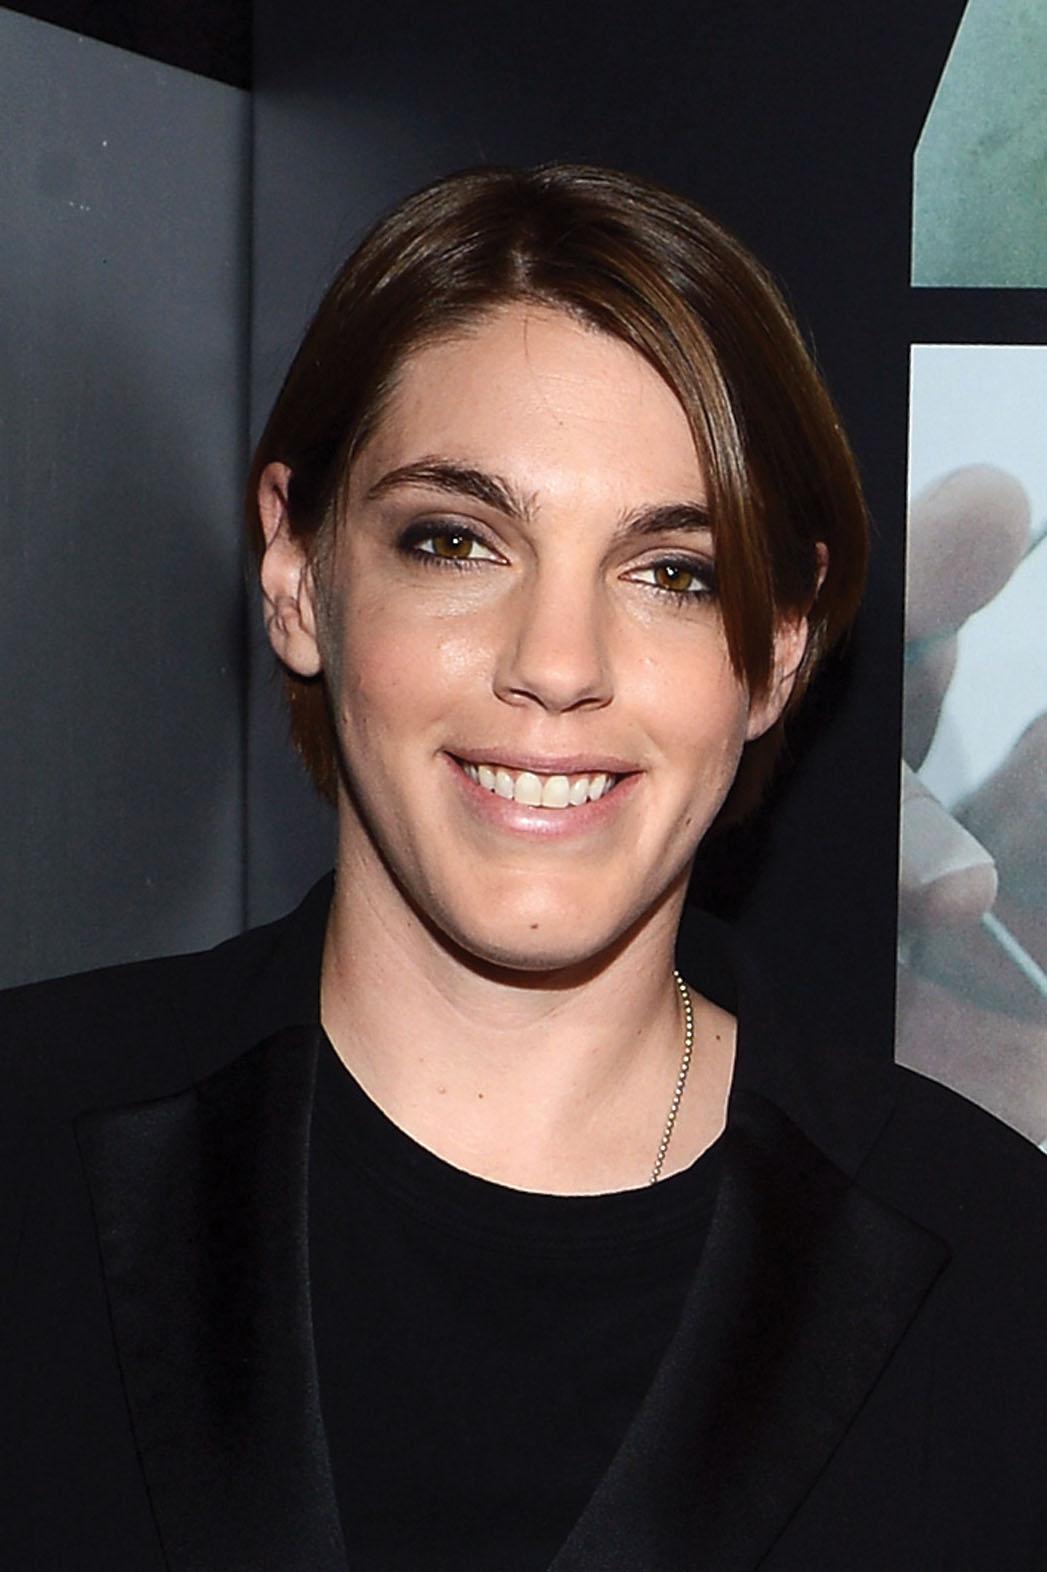 Megan Elison Headshot - P 2013